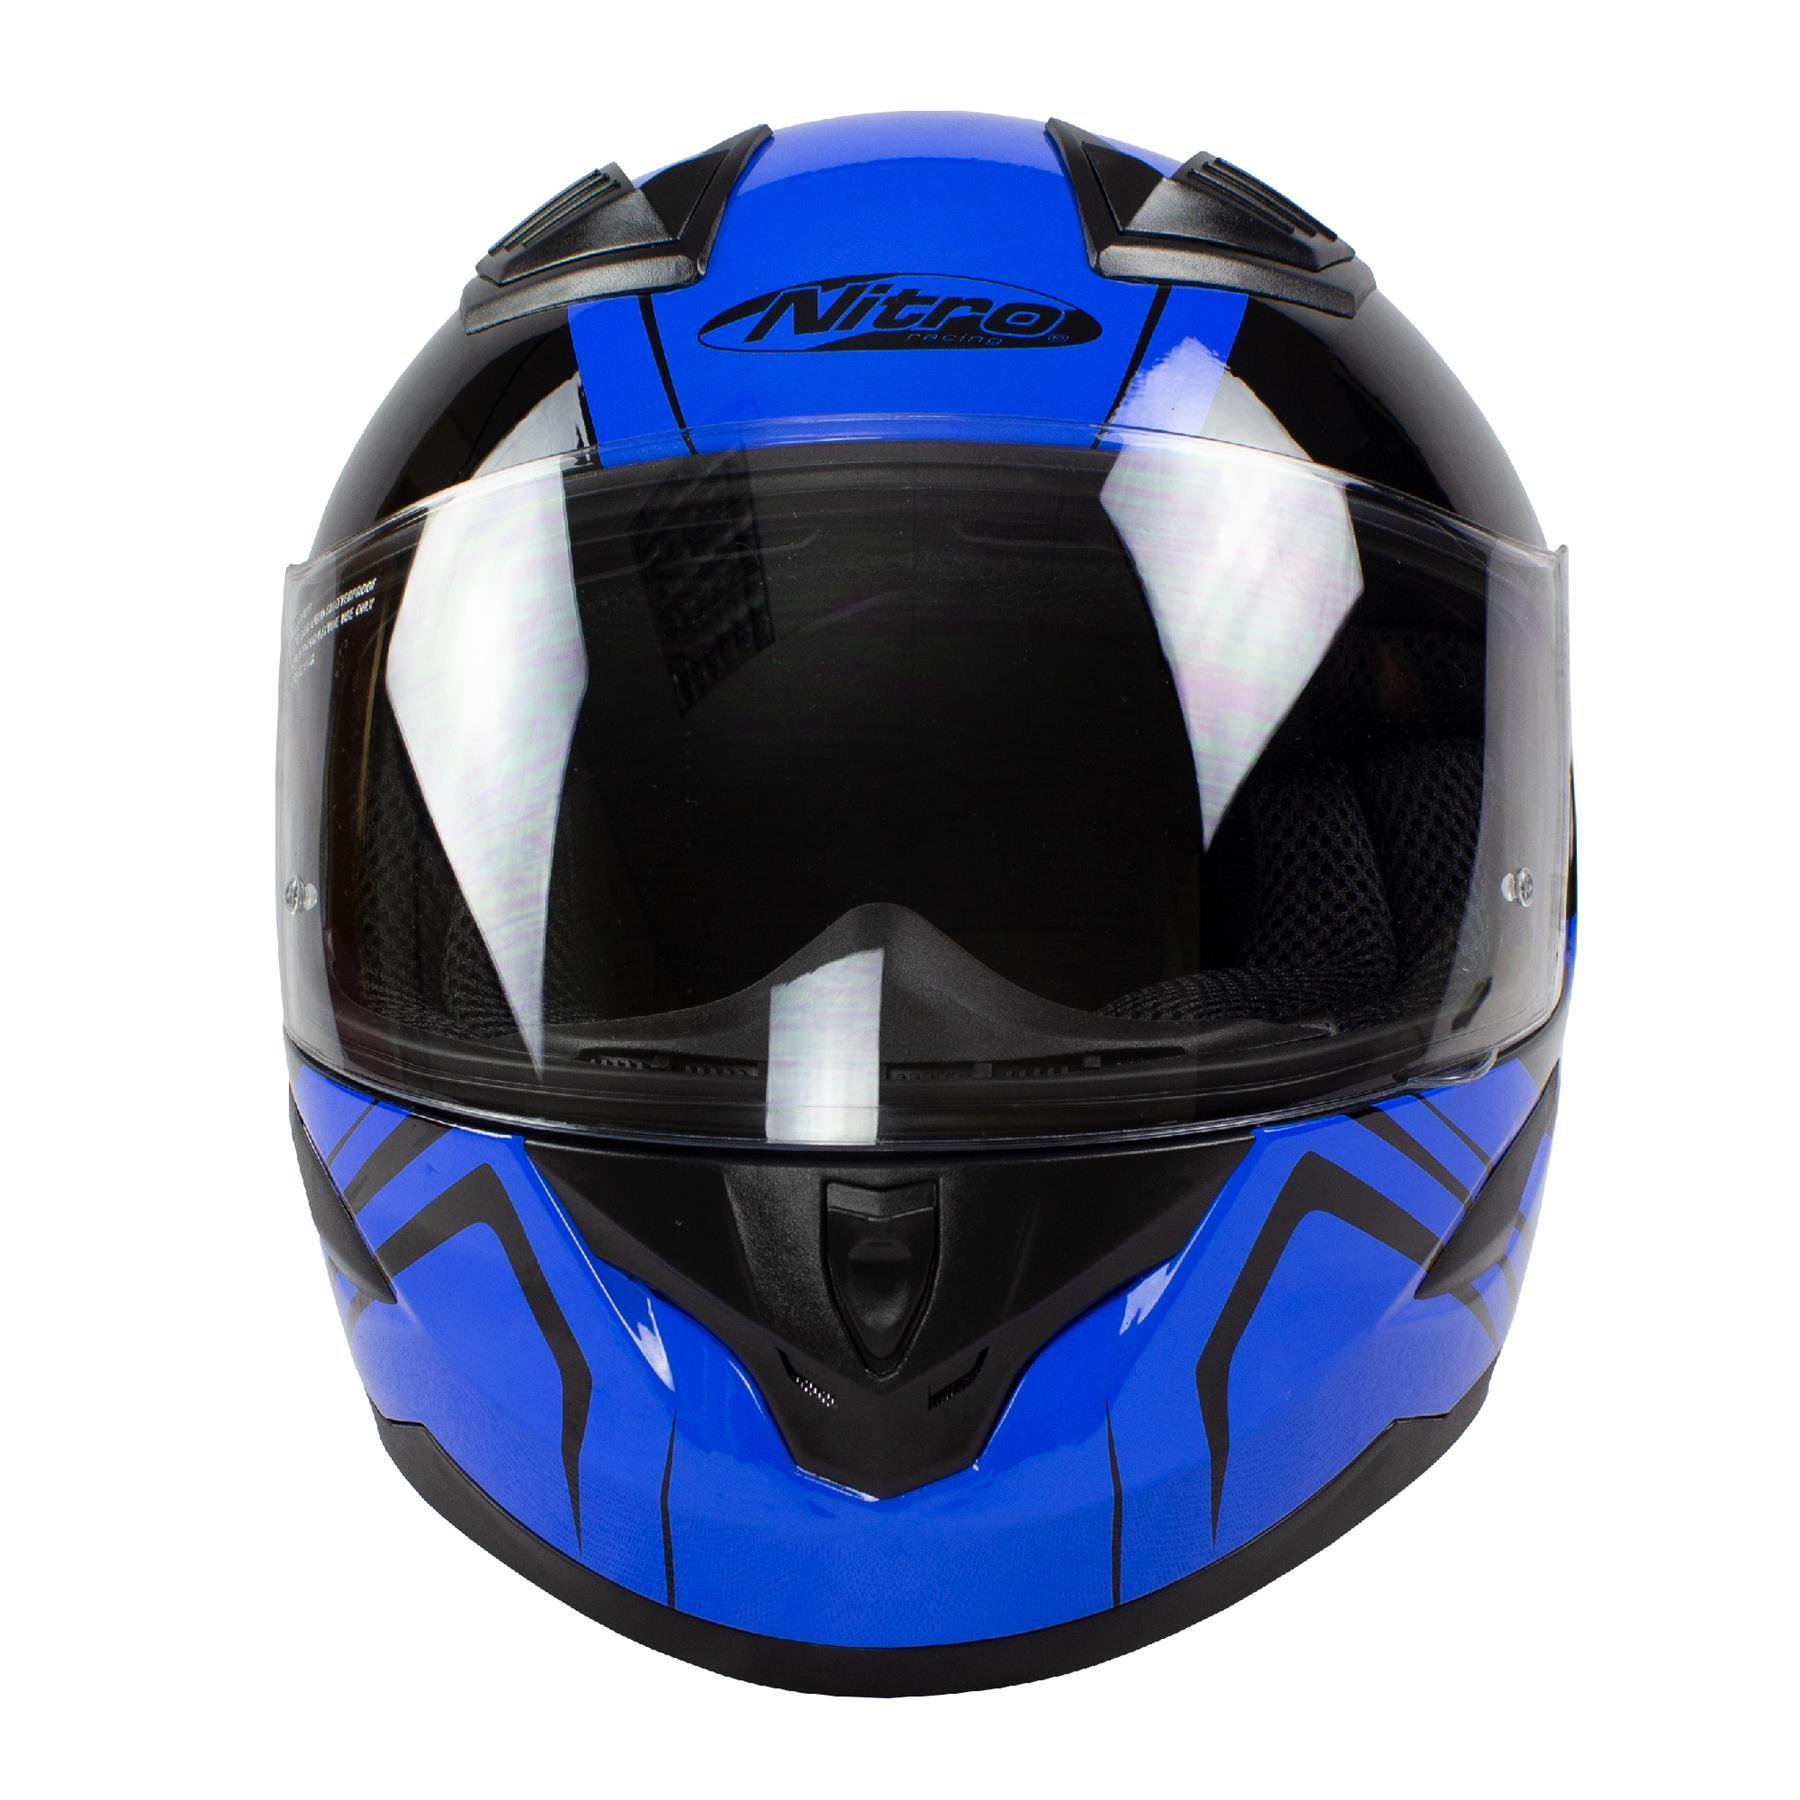 Nitro-N2400-Rogue-Full-Face-Motorcycle-Motorbike-Crash-Helmet-Black-Blue-Red thumbnail 13